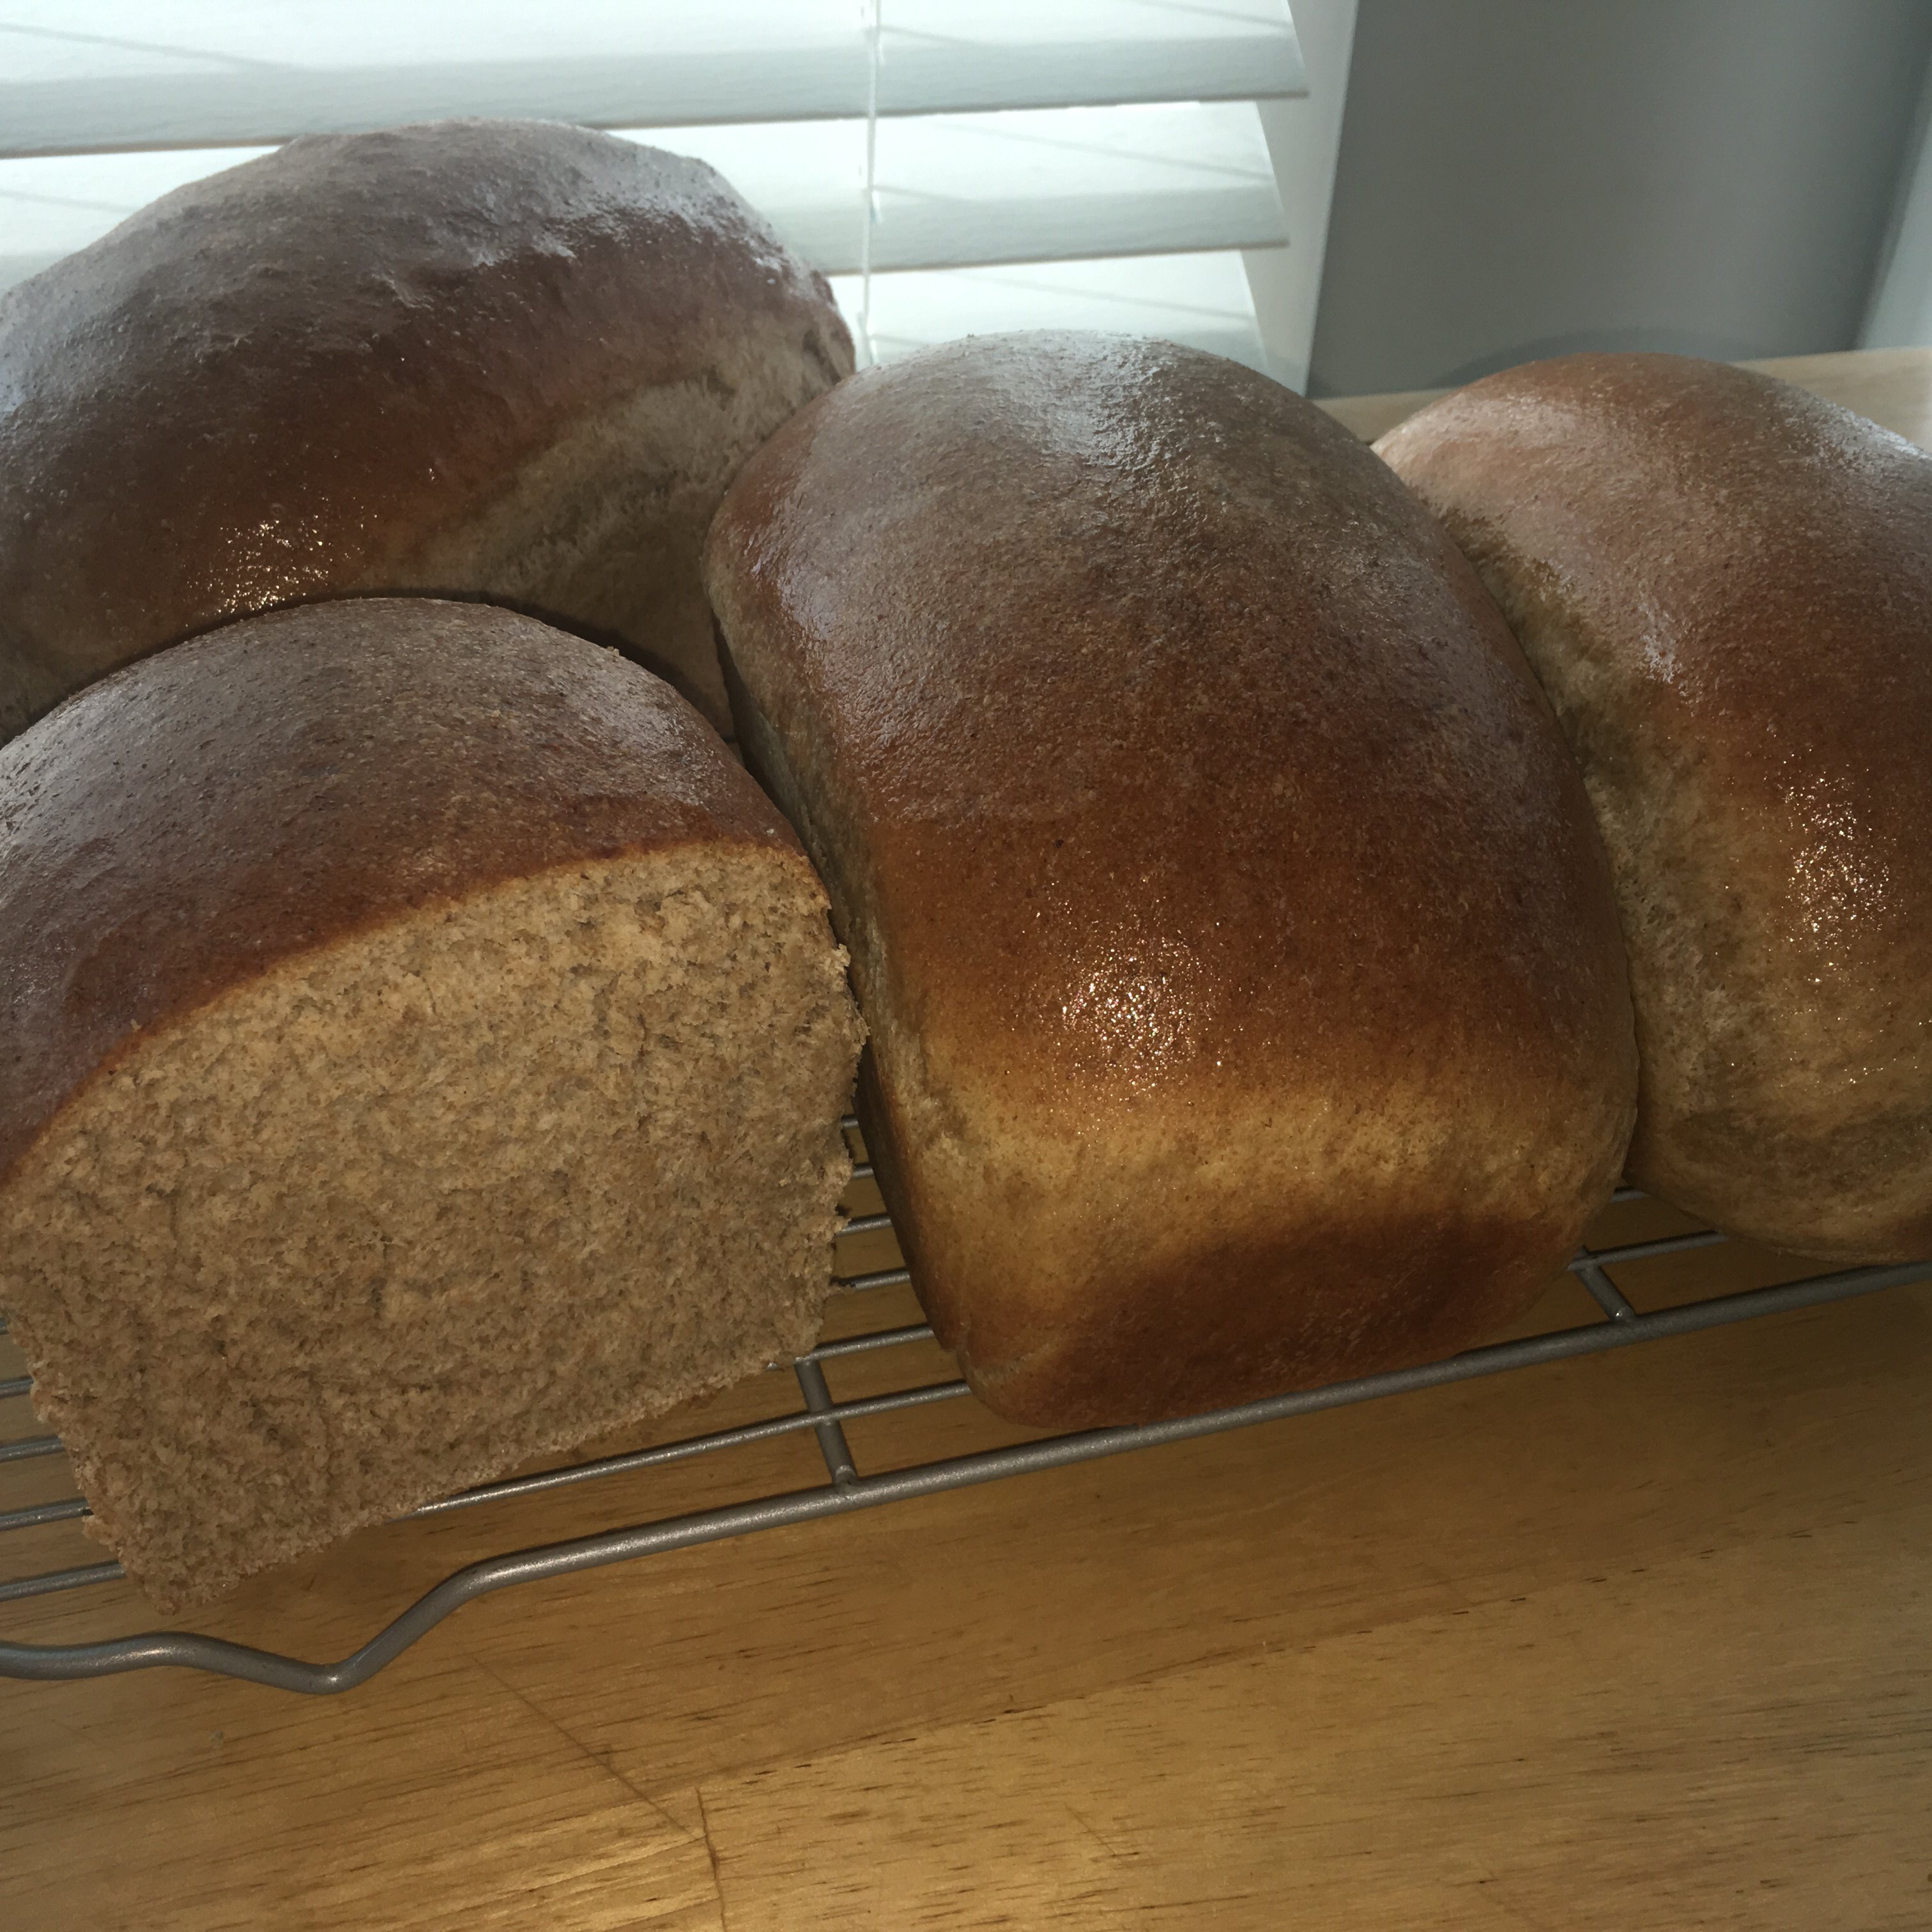 Whole Wheat Bread II